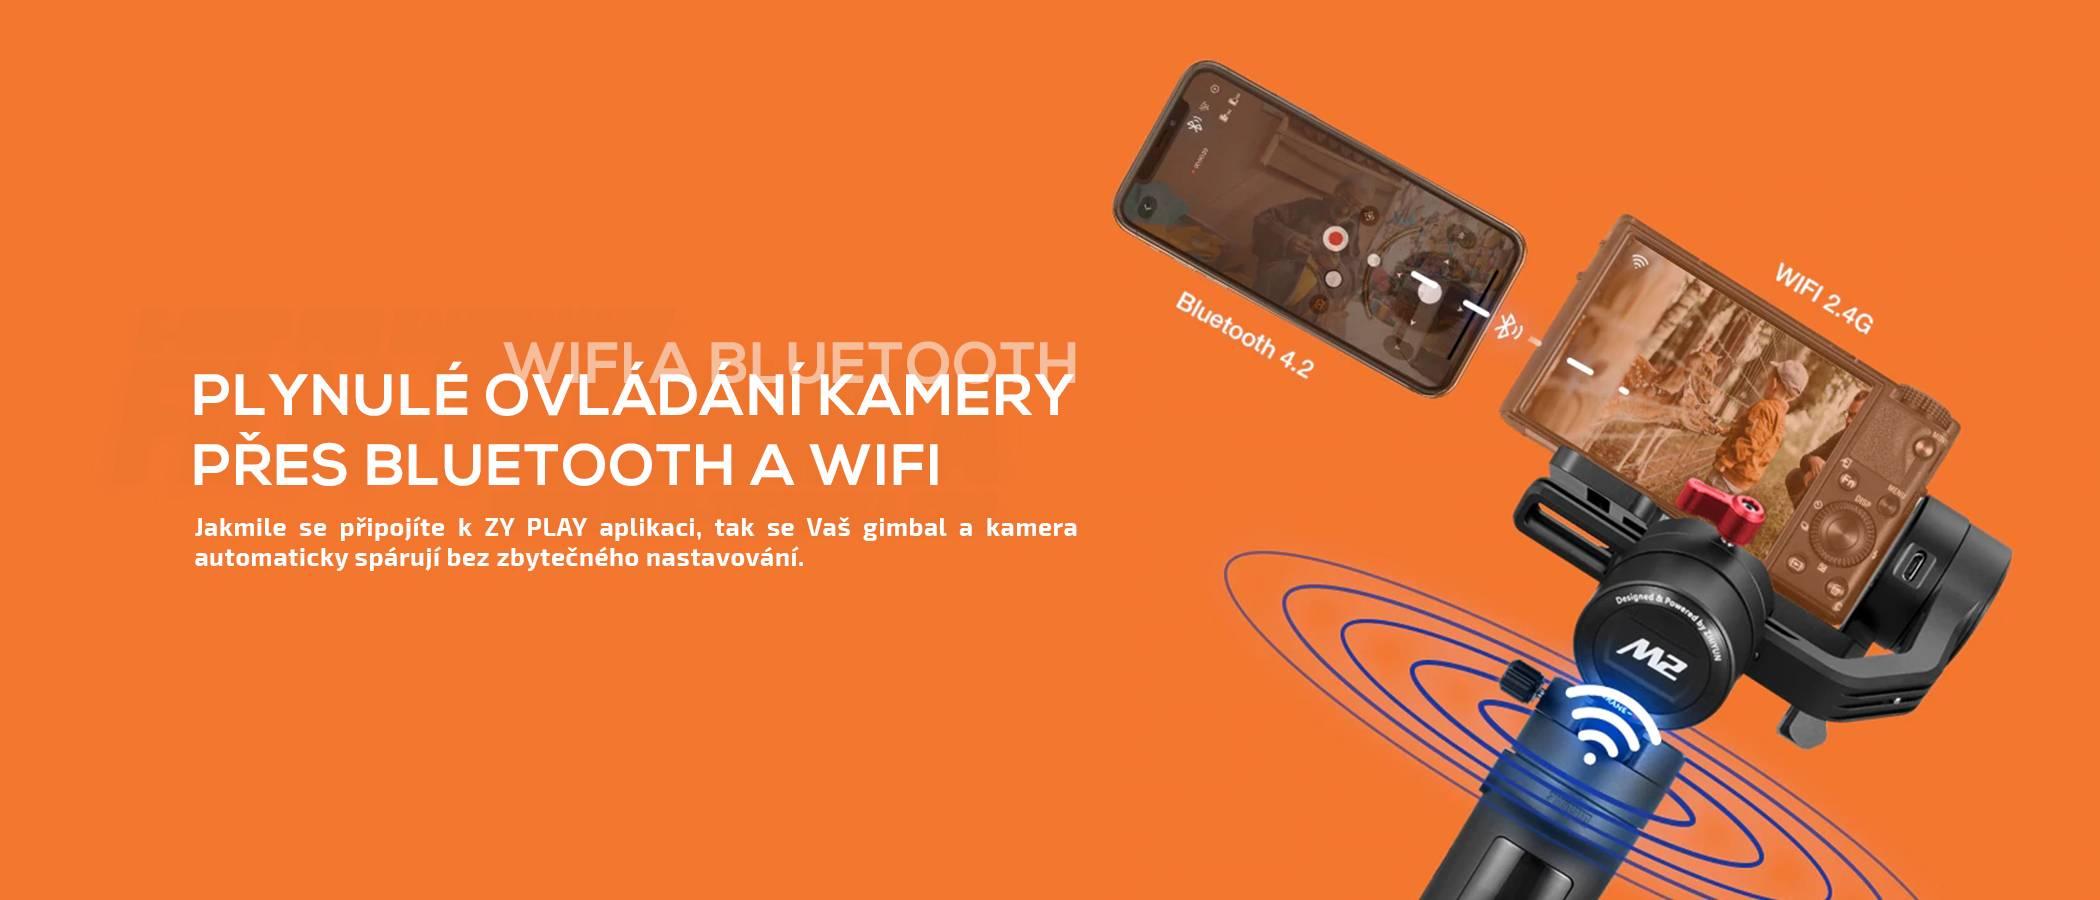 film-technika-zhiyun-m2-gimbal-bluetooth-a-wifi